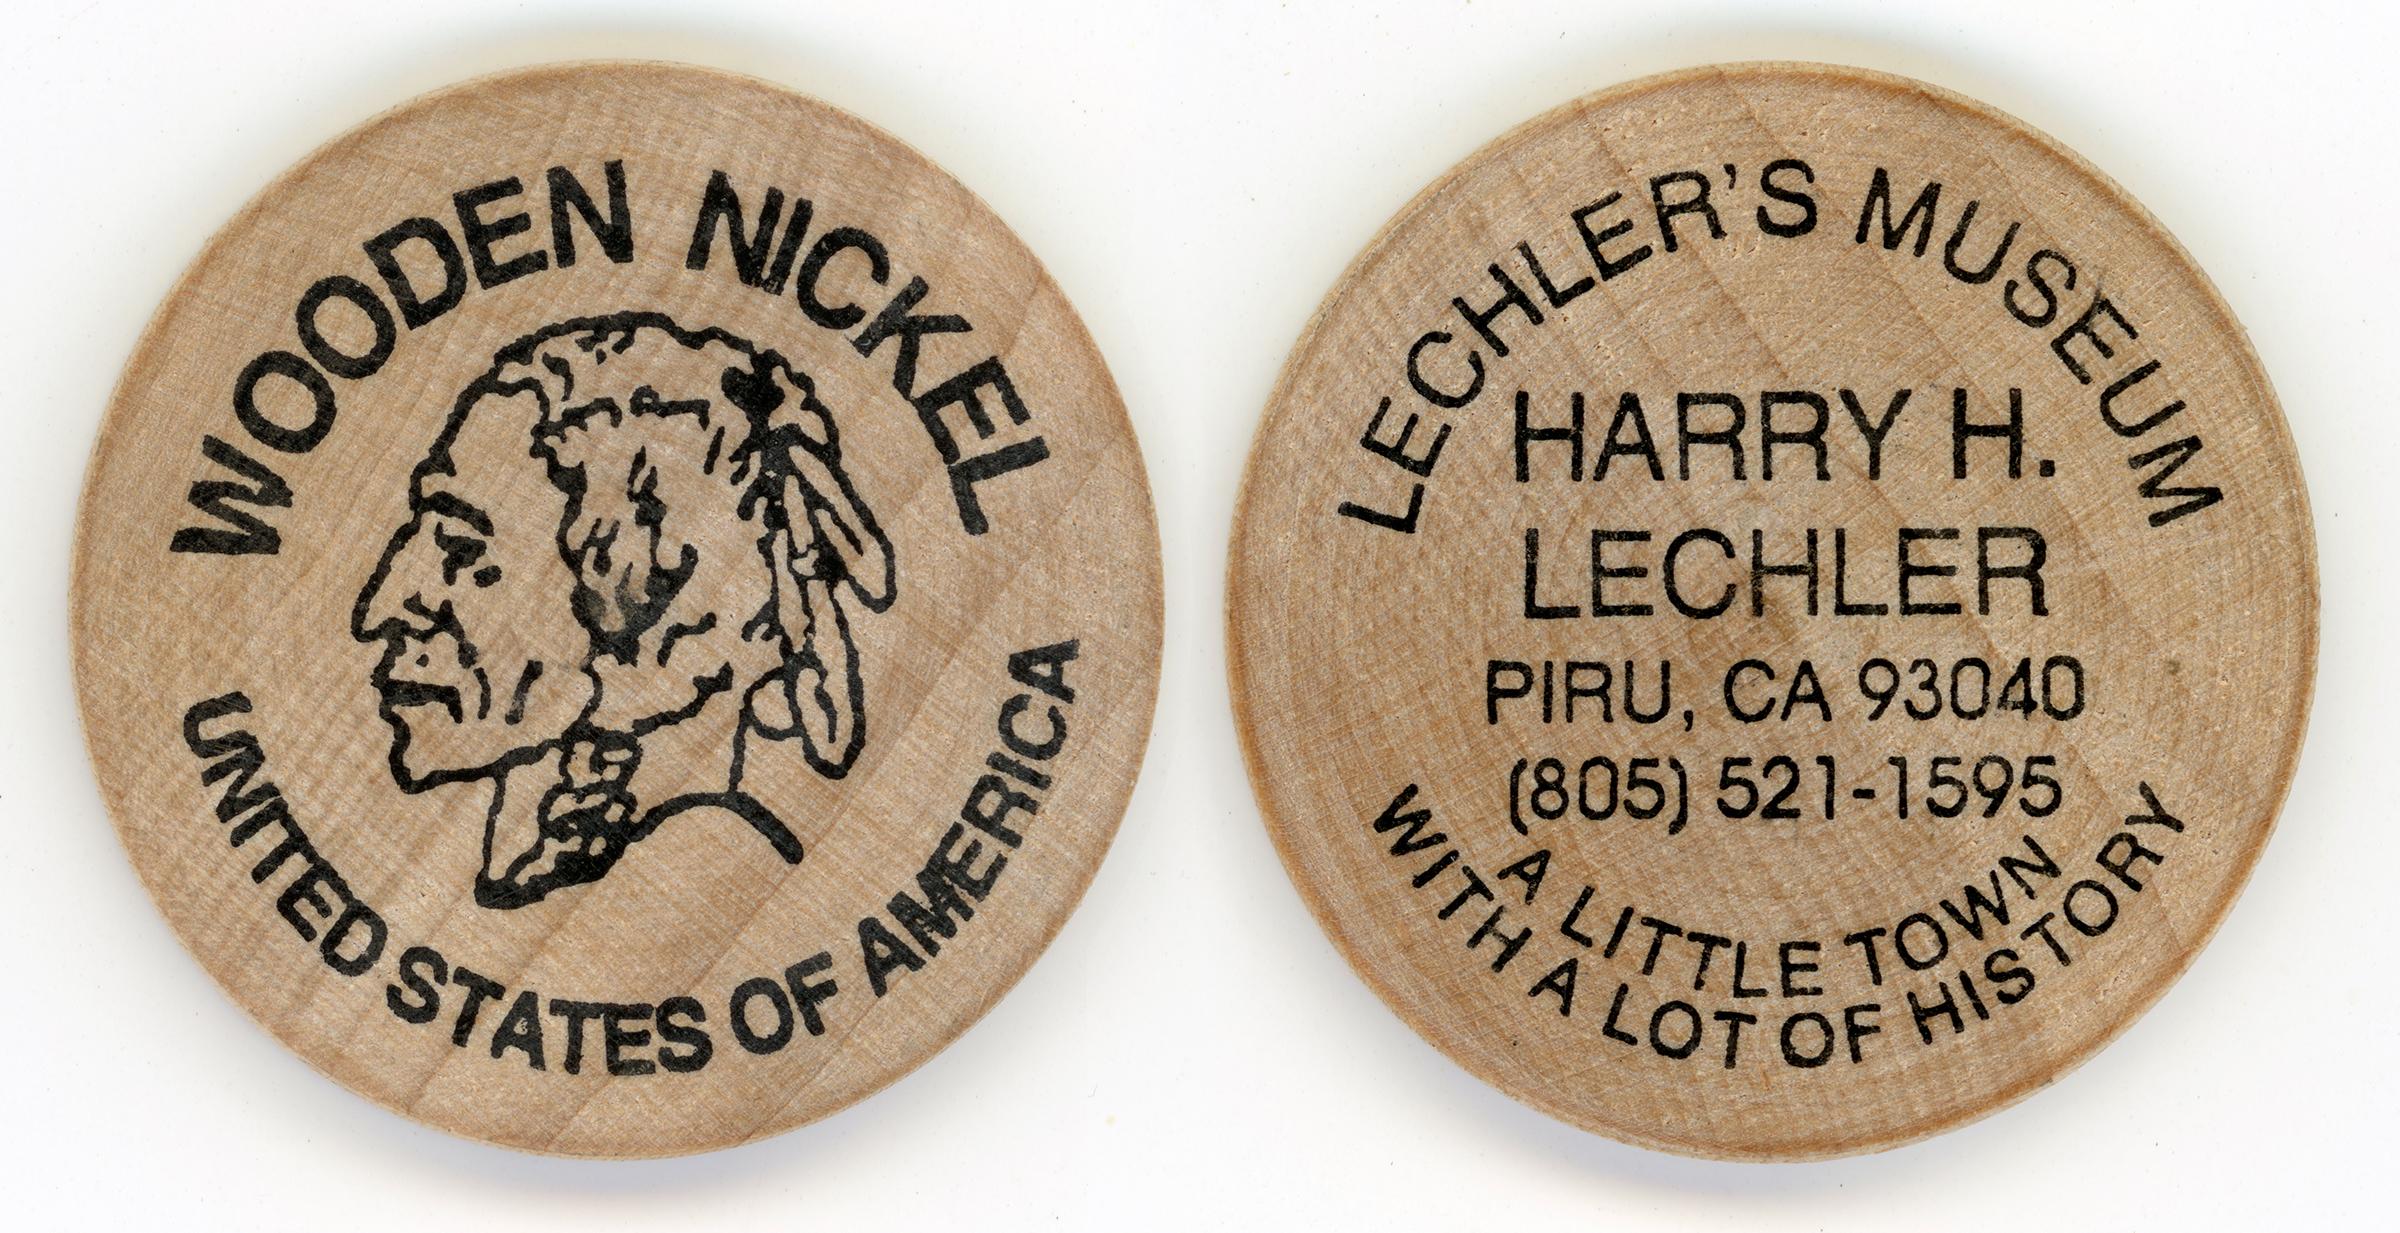 Scvhistorycom Hb1825 Piru Harry Lechlers Museum Wooden Nickel